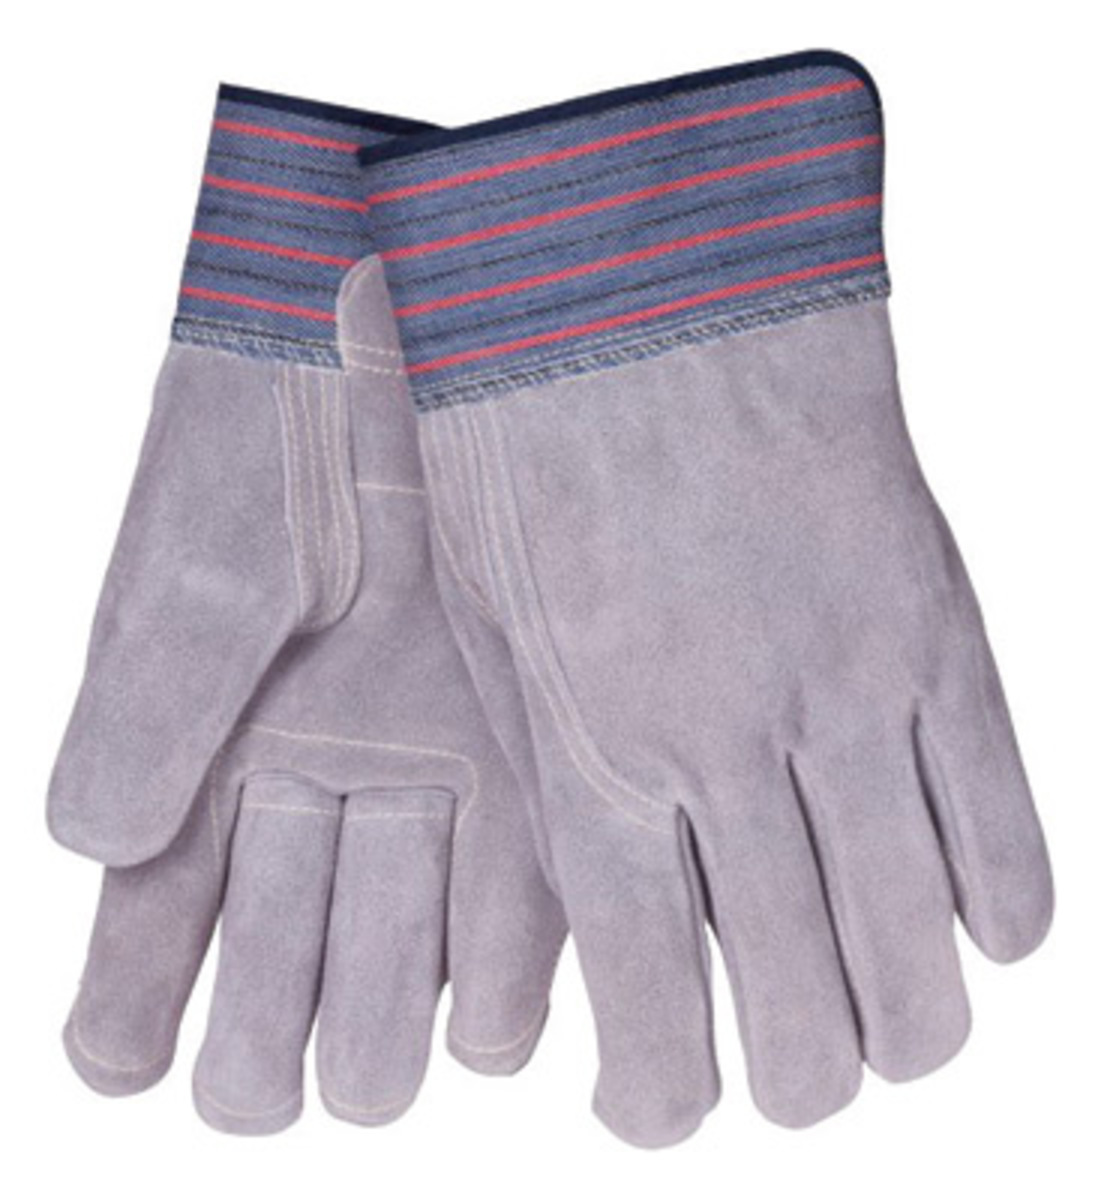 Tillman leather work gloves - Tillman Large Premium Grade Side Split Double Palm Cowhide Leather Palm Glove With 2 1